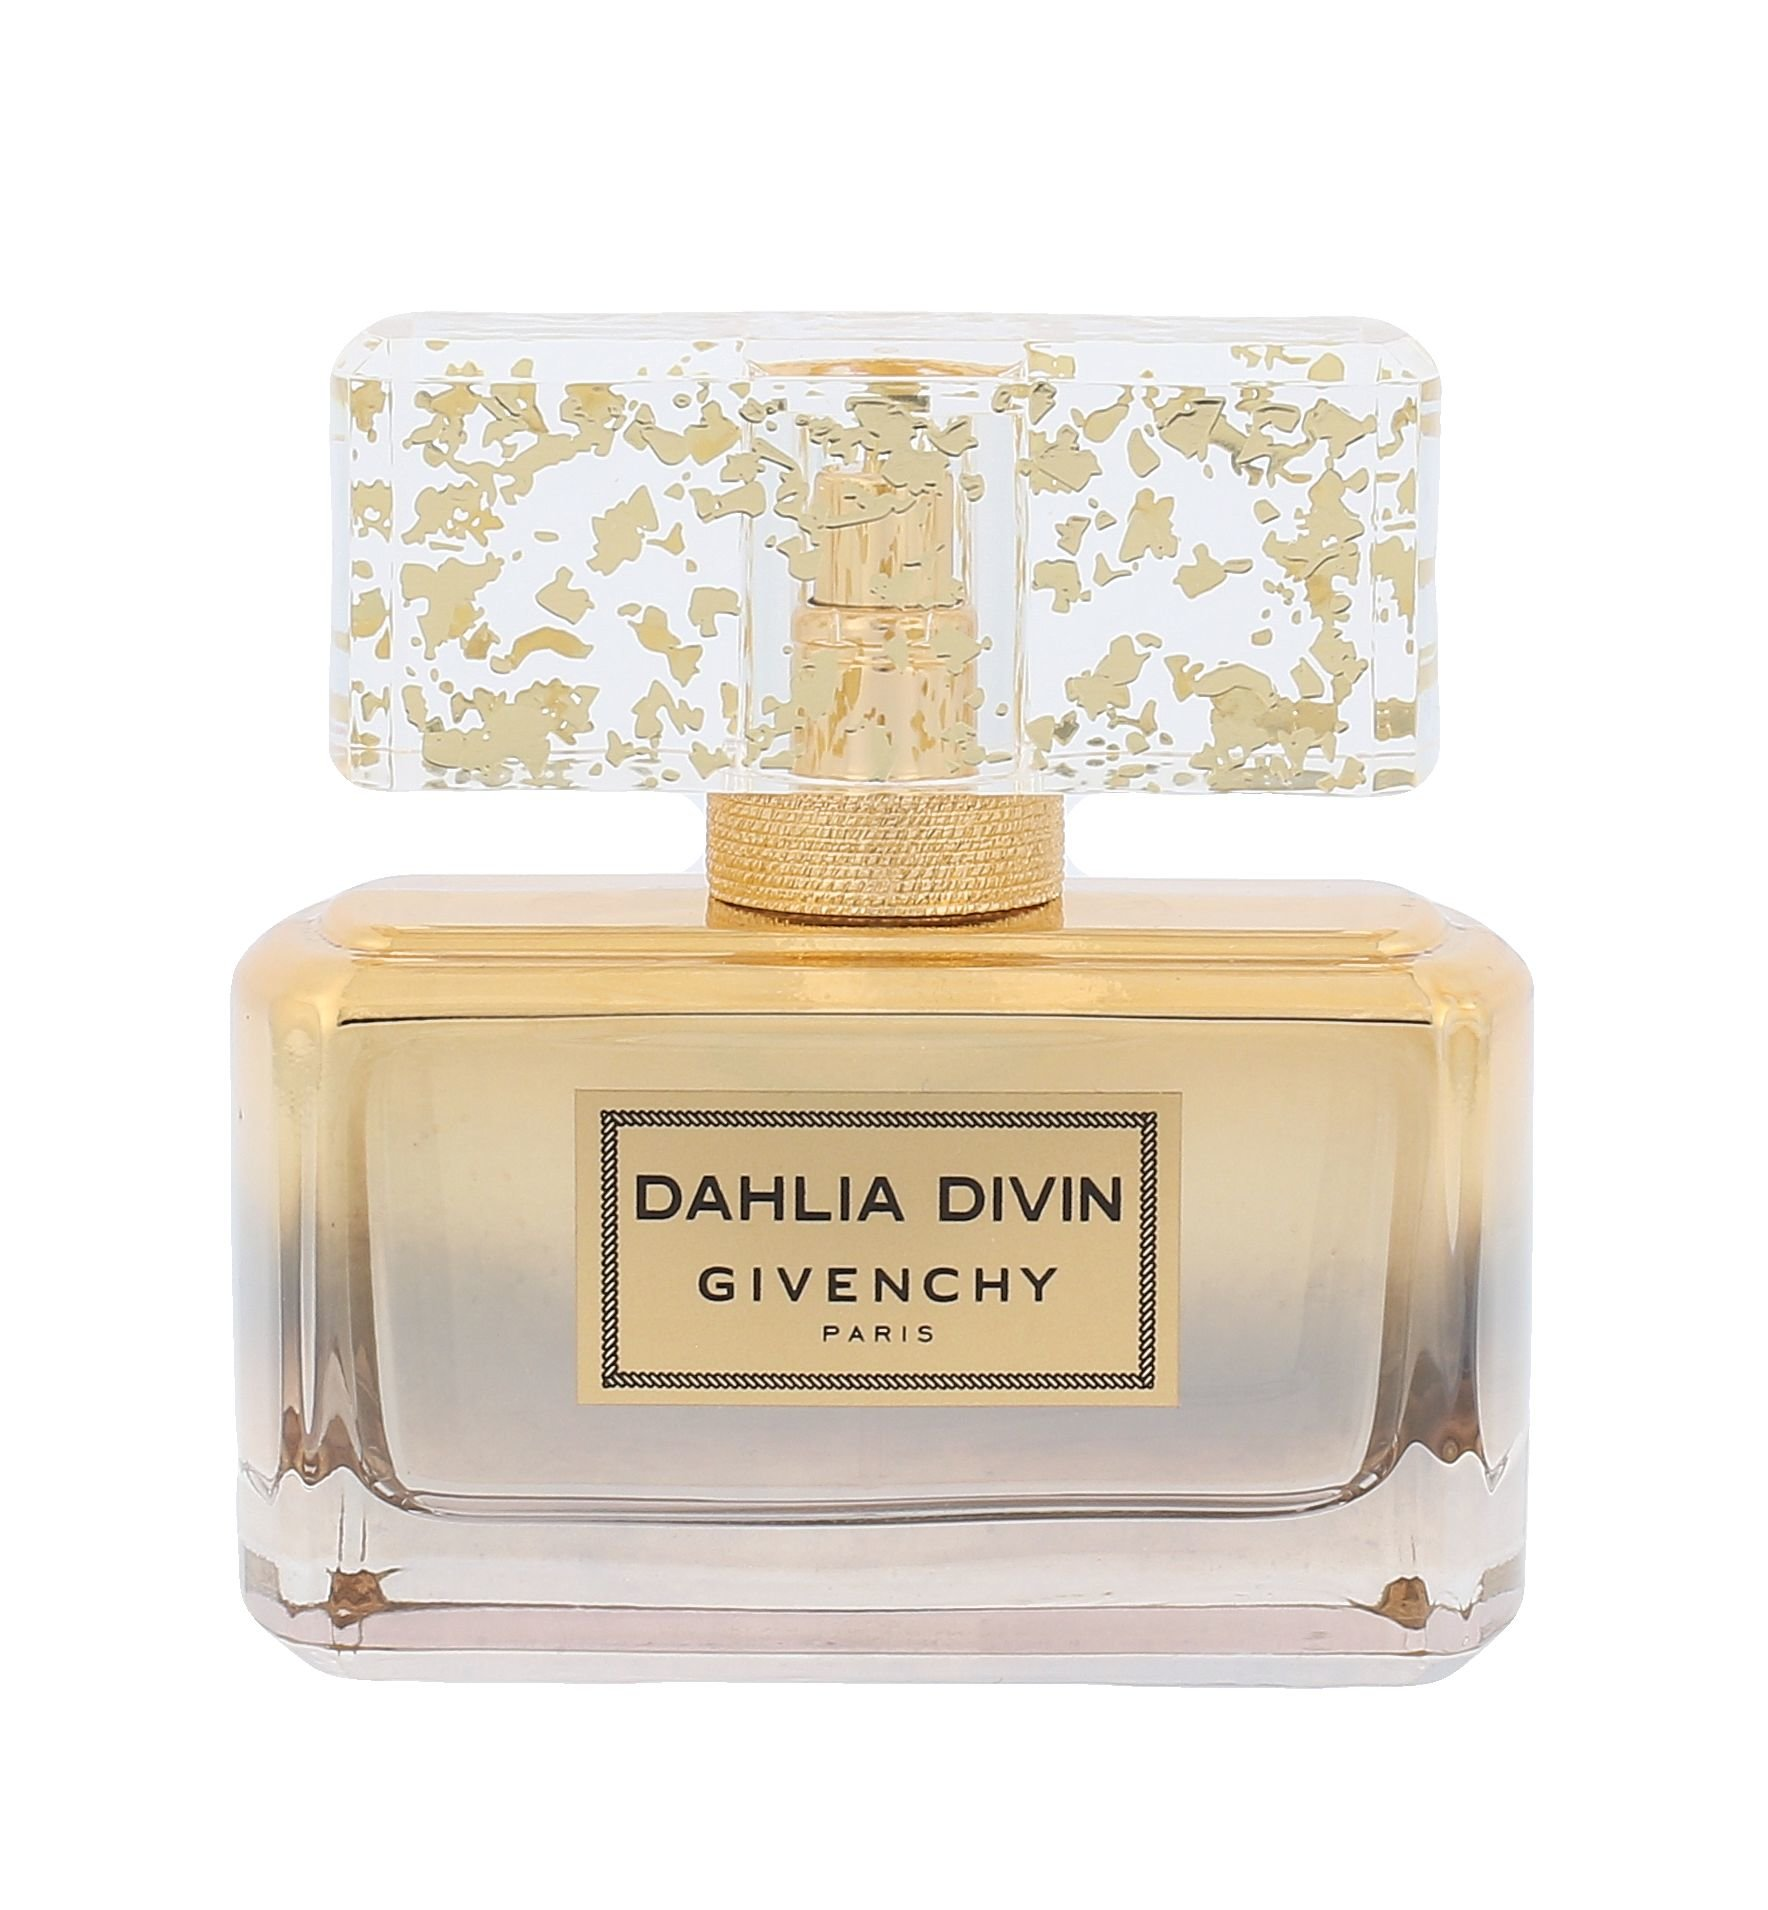 Givenchy Dahlia Divin EDP 50ml  Le Nectar de Parfum